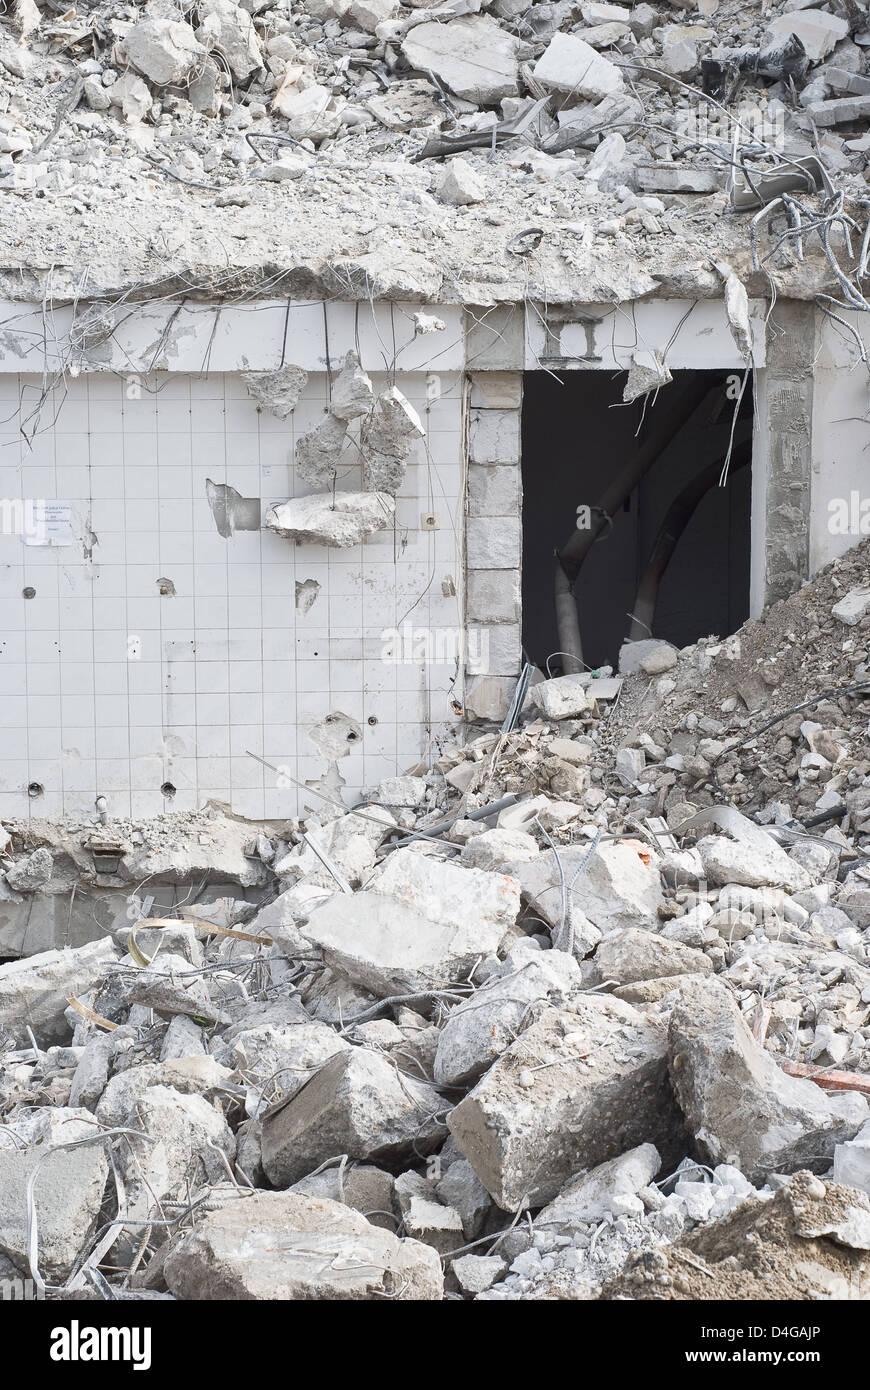 Building Demolition as Sign of Urban Renewal - Stock Image